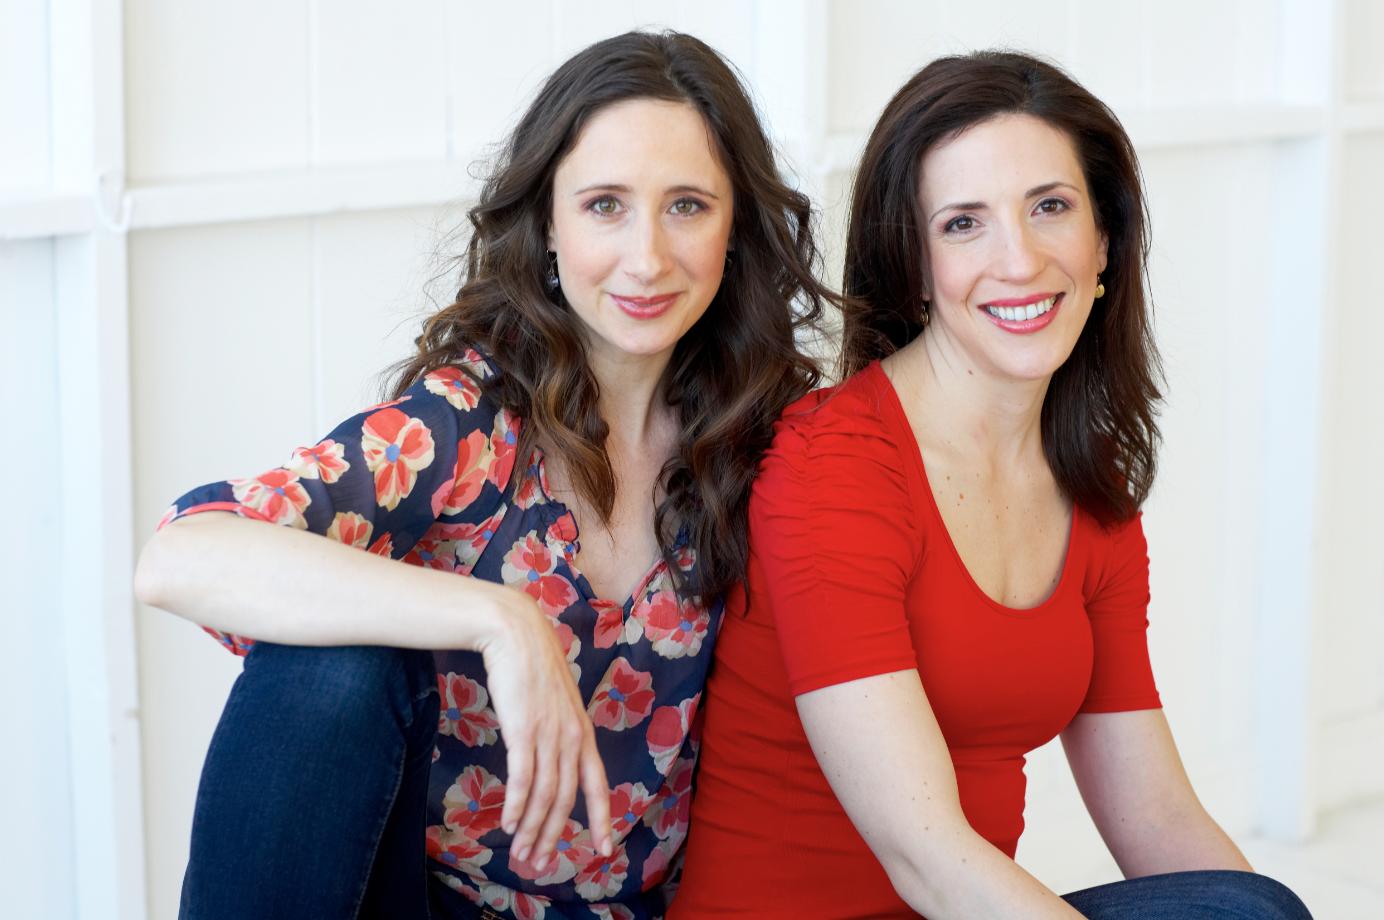 Emma McLaughlin and Nicola Kraus